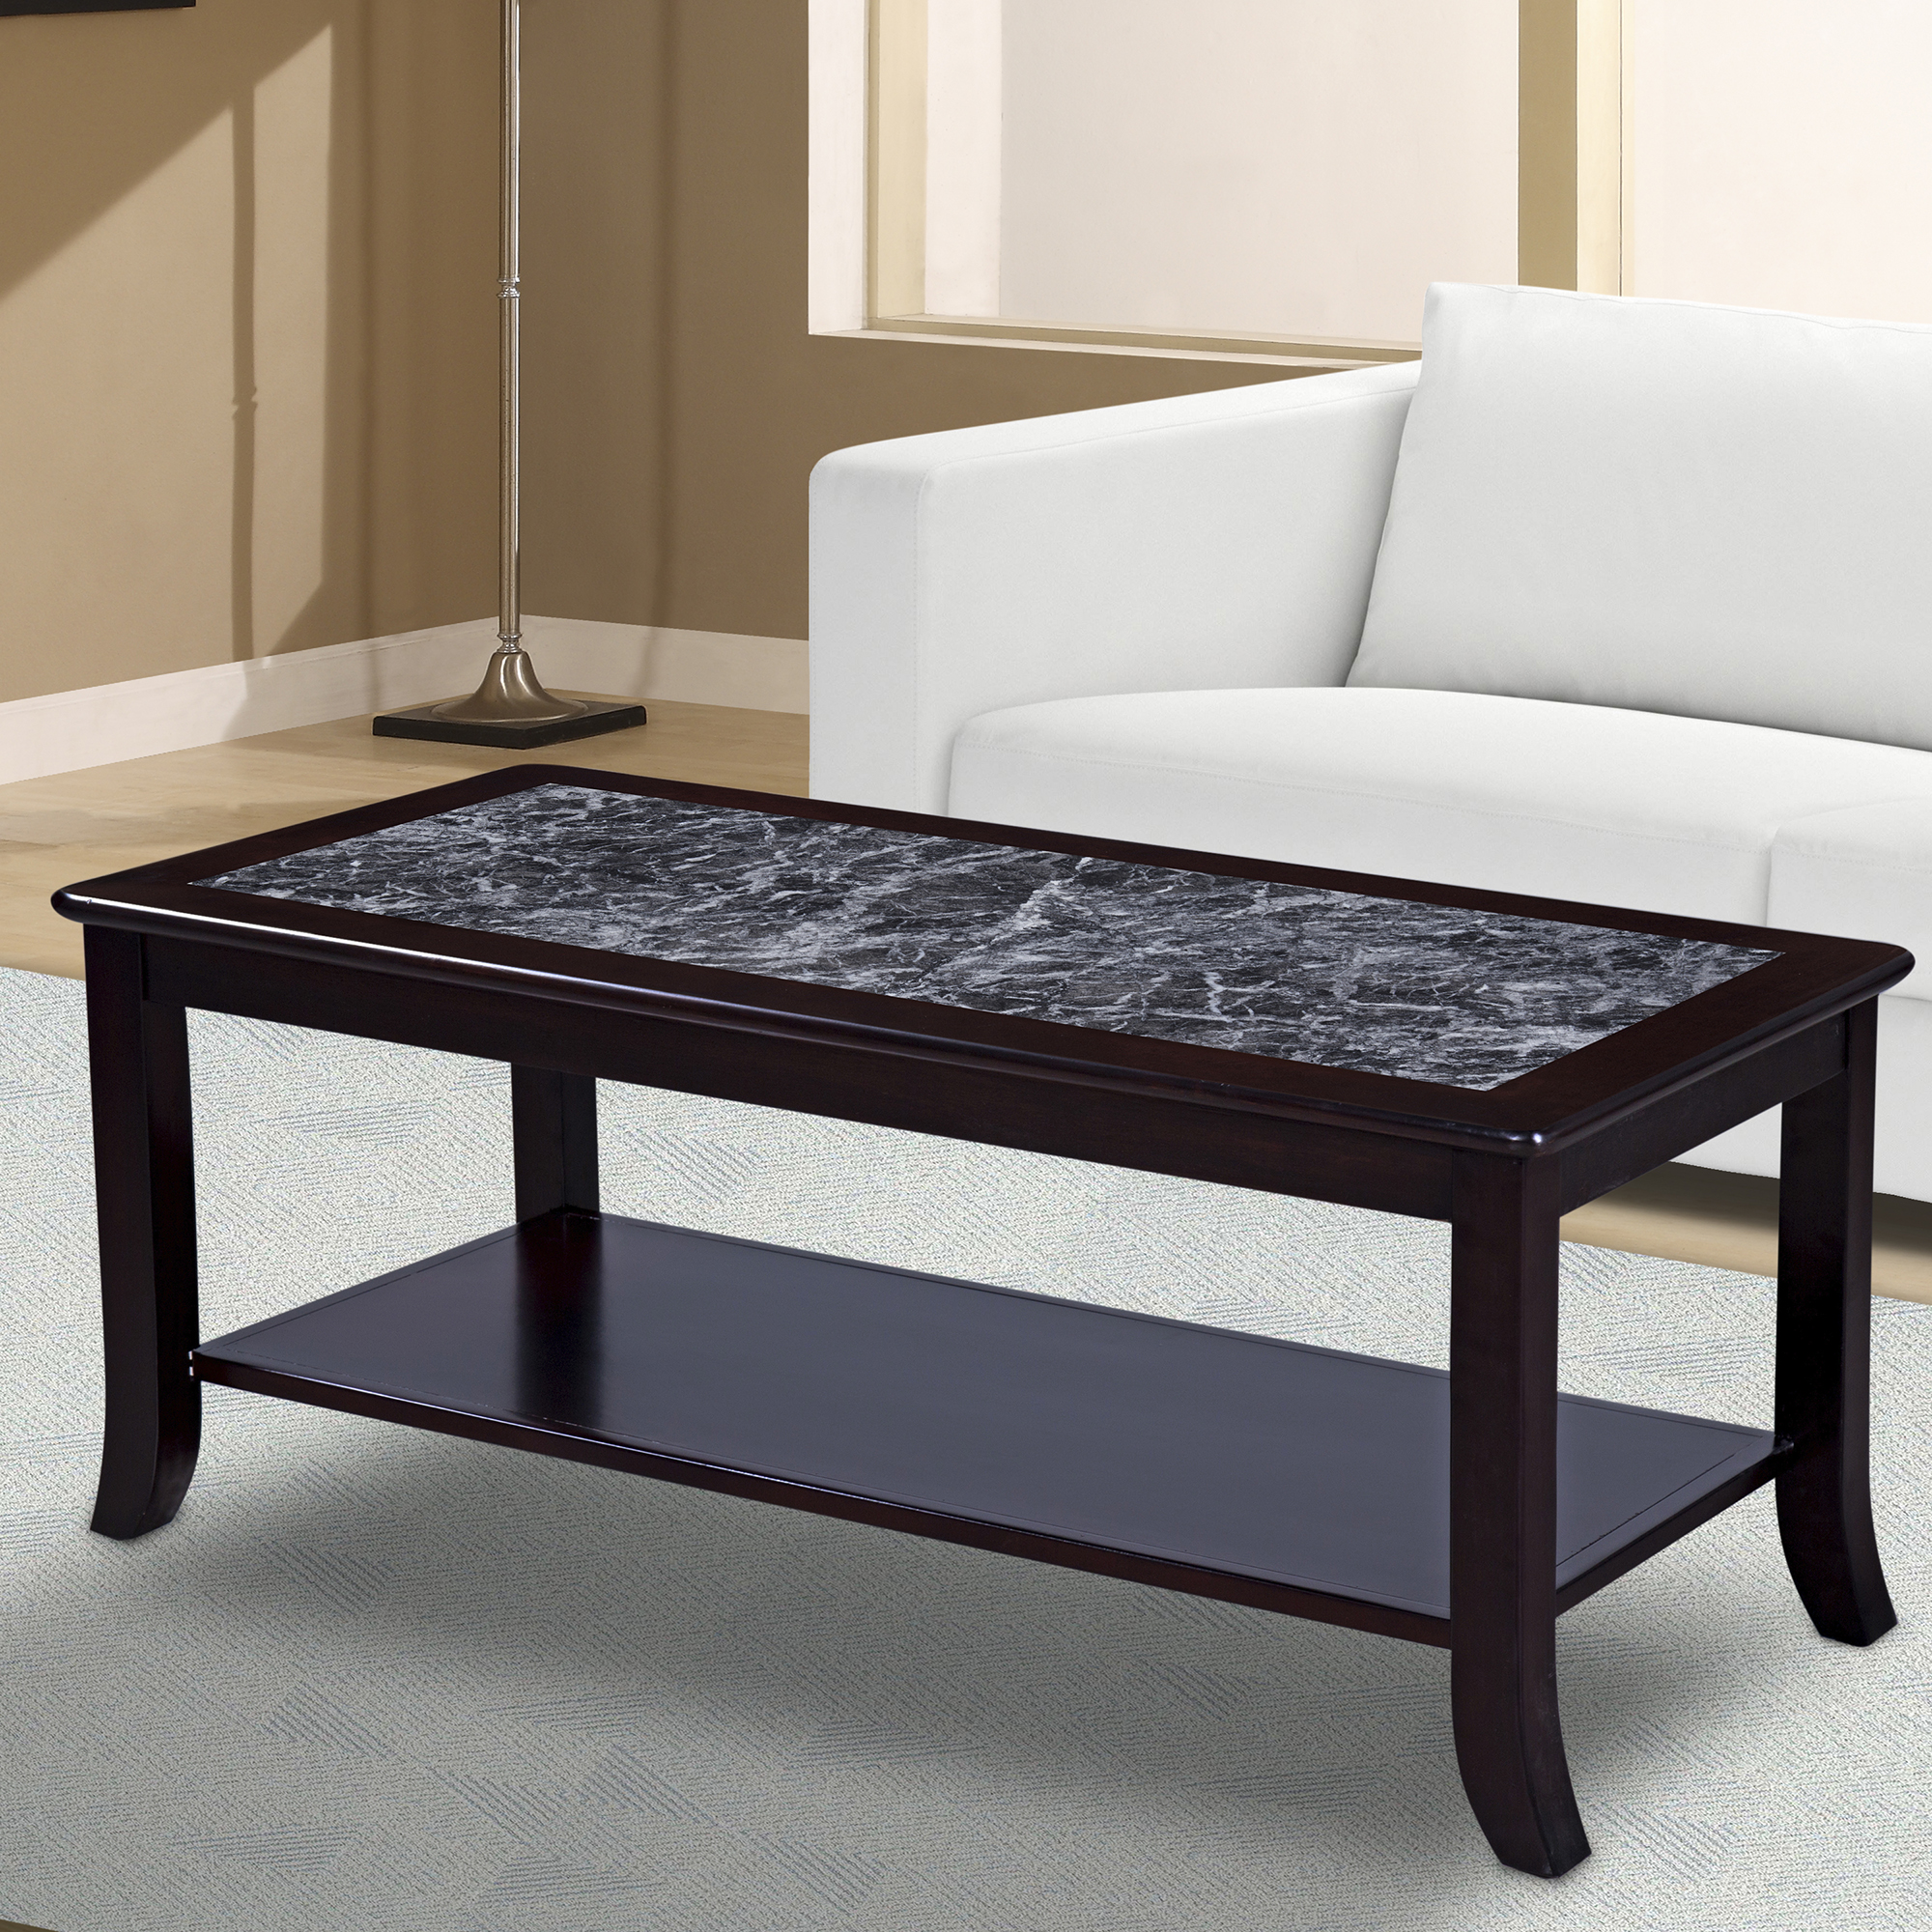 GranRest Marble Top Coffee Table, Black, Wood Frame